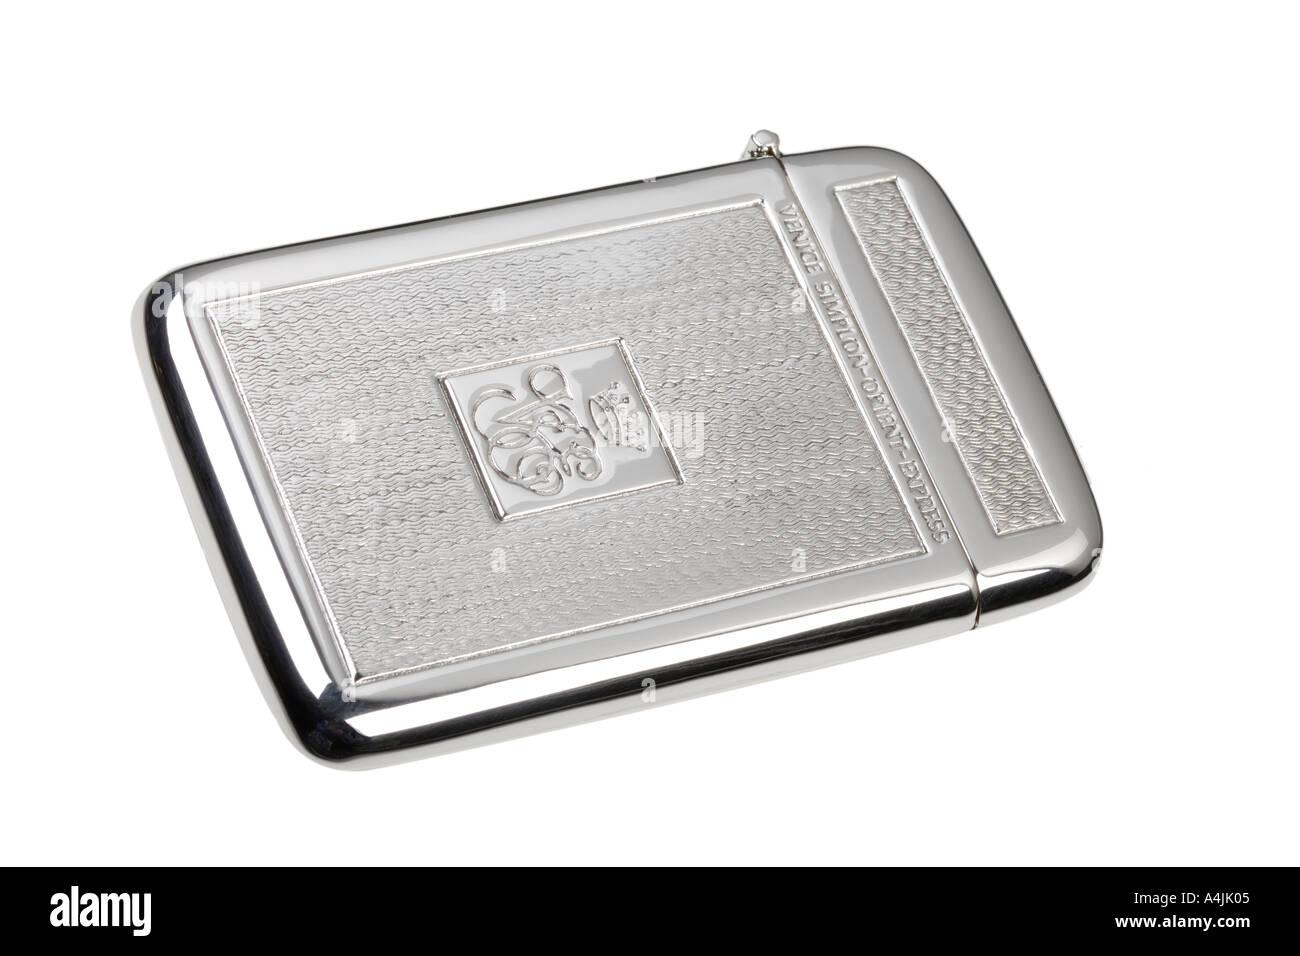 silver business card holder Venice Simplon Orient Express Stock ...